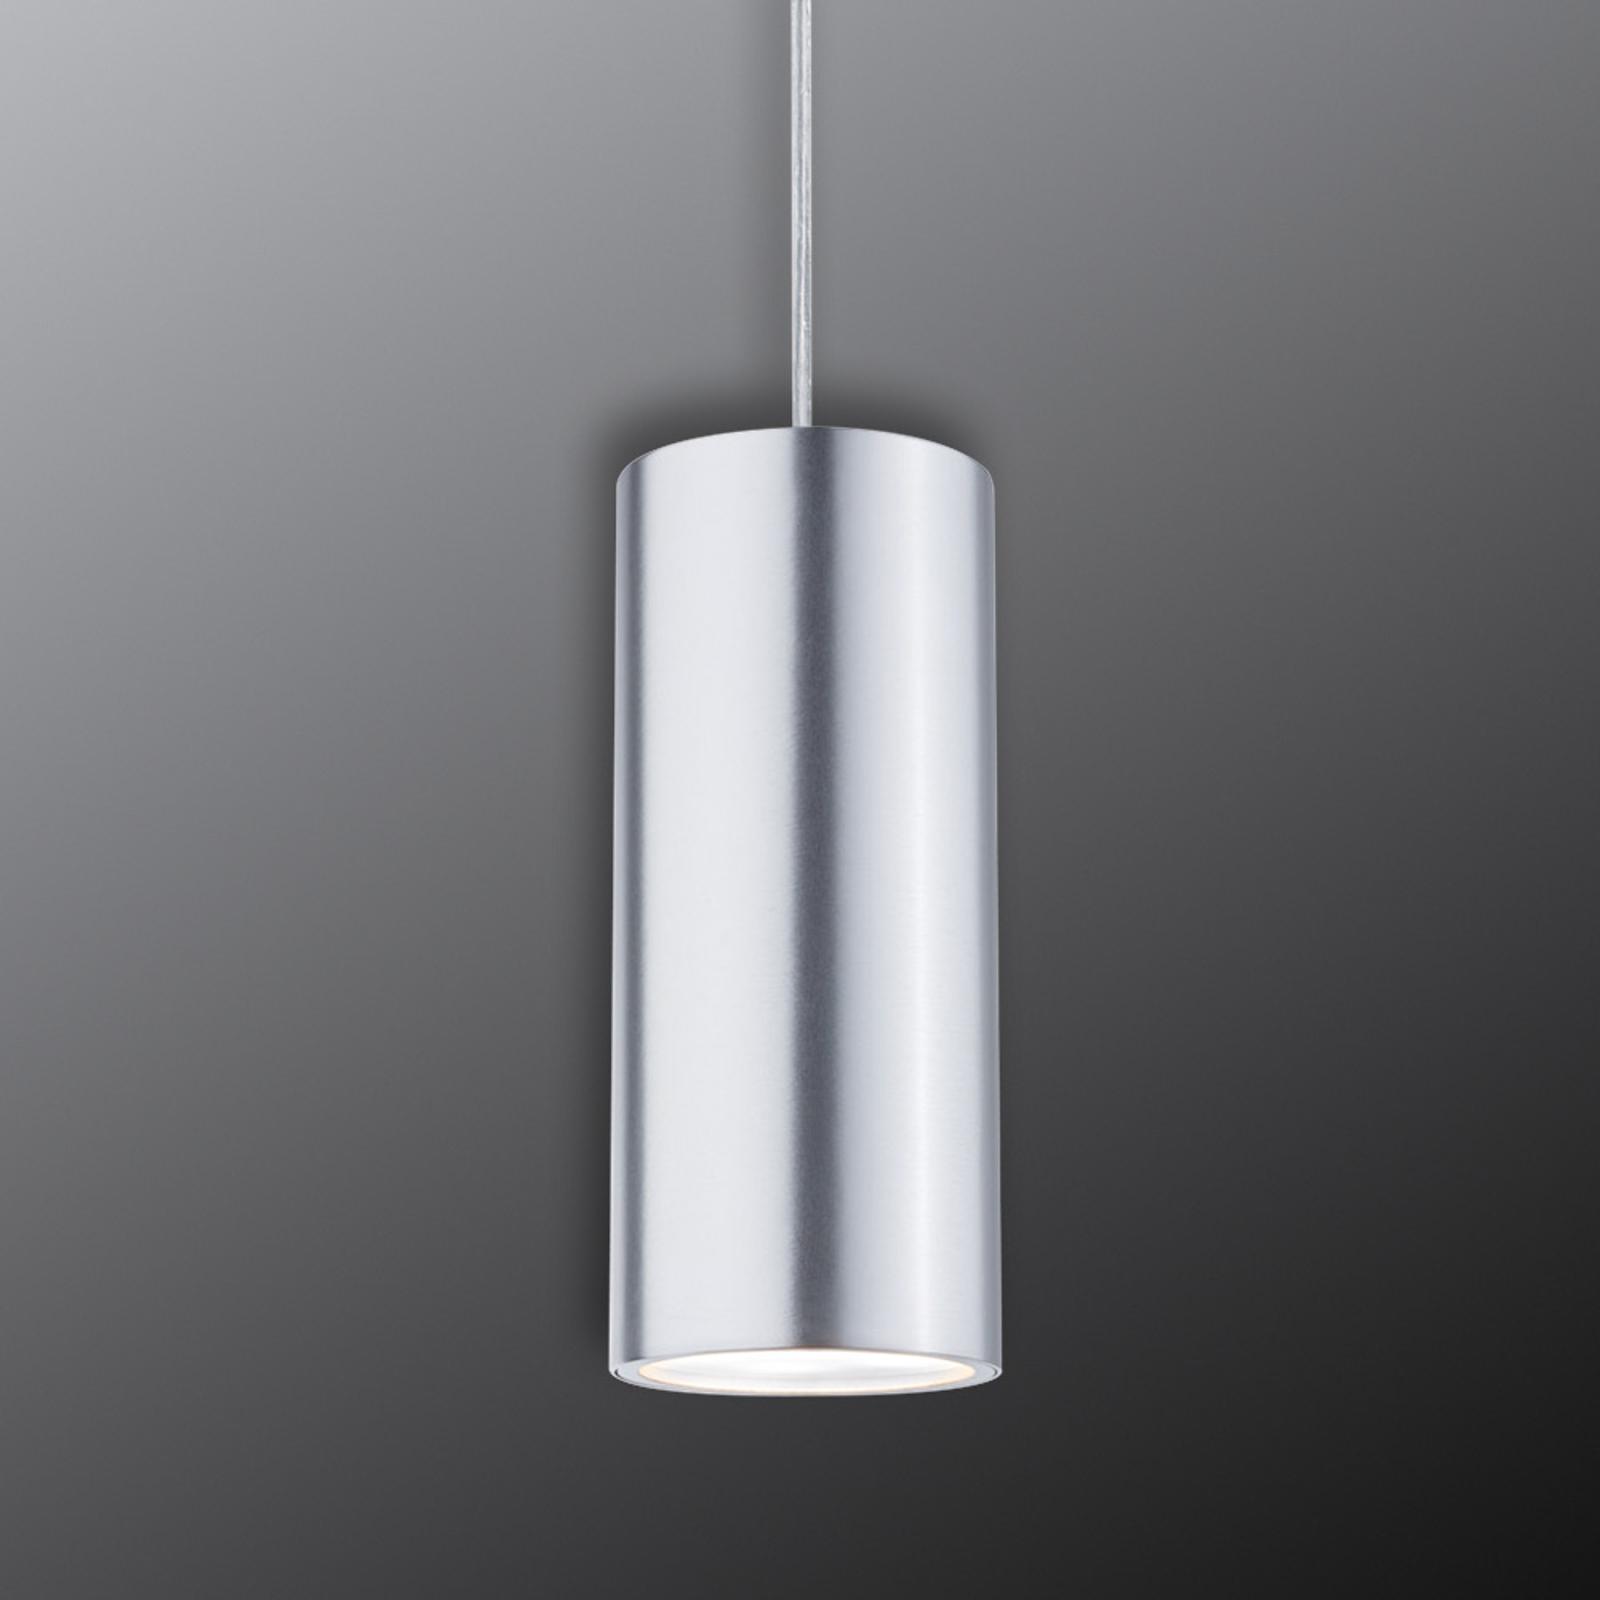 Paulmann URail Barrel lampa wisząca LED, chrom